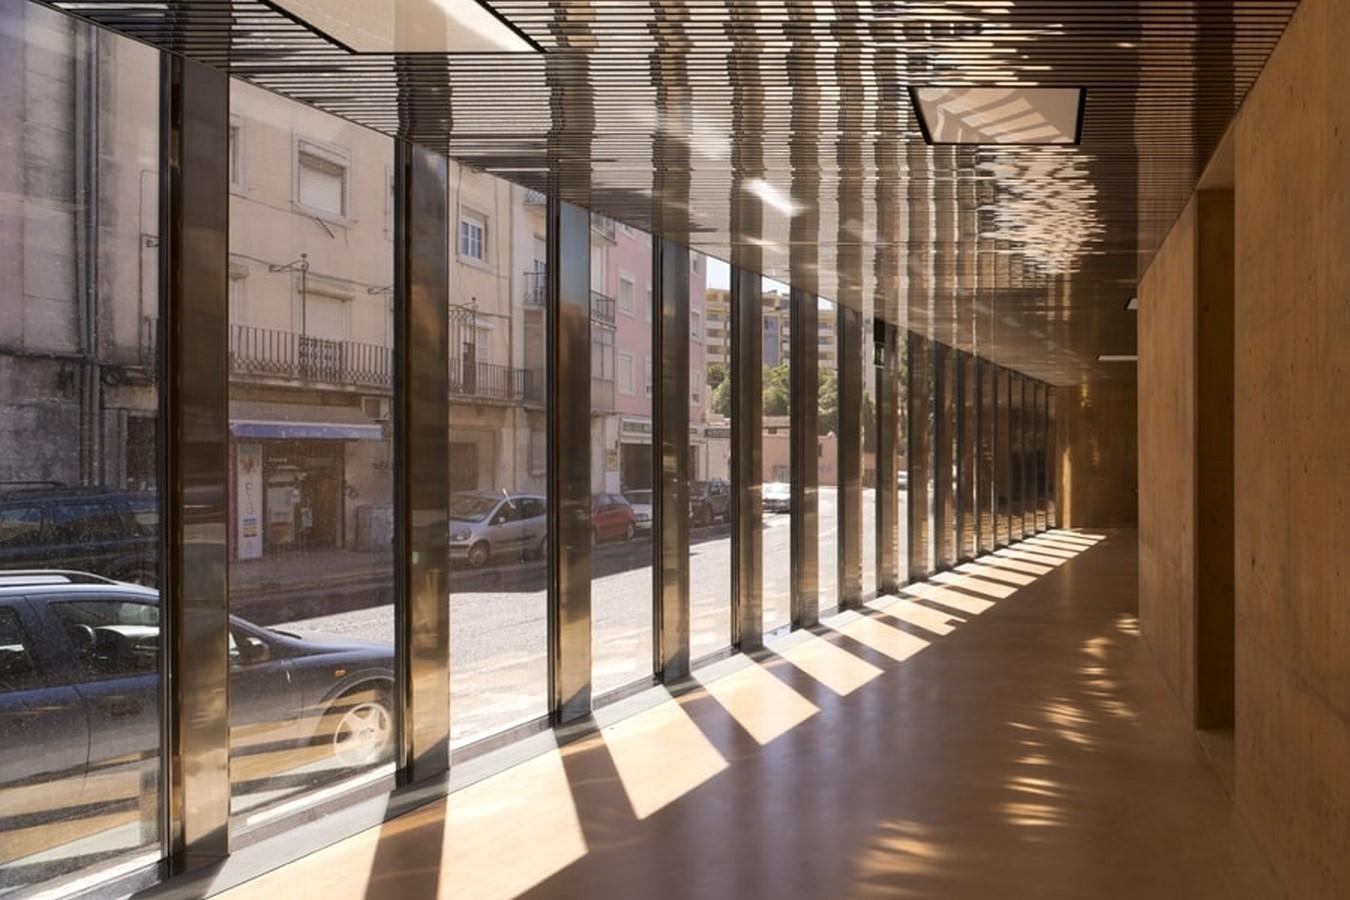 Thalia Theatre, Lisbon, Portugal - Sheet3